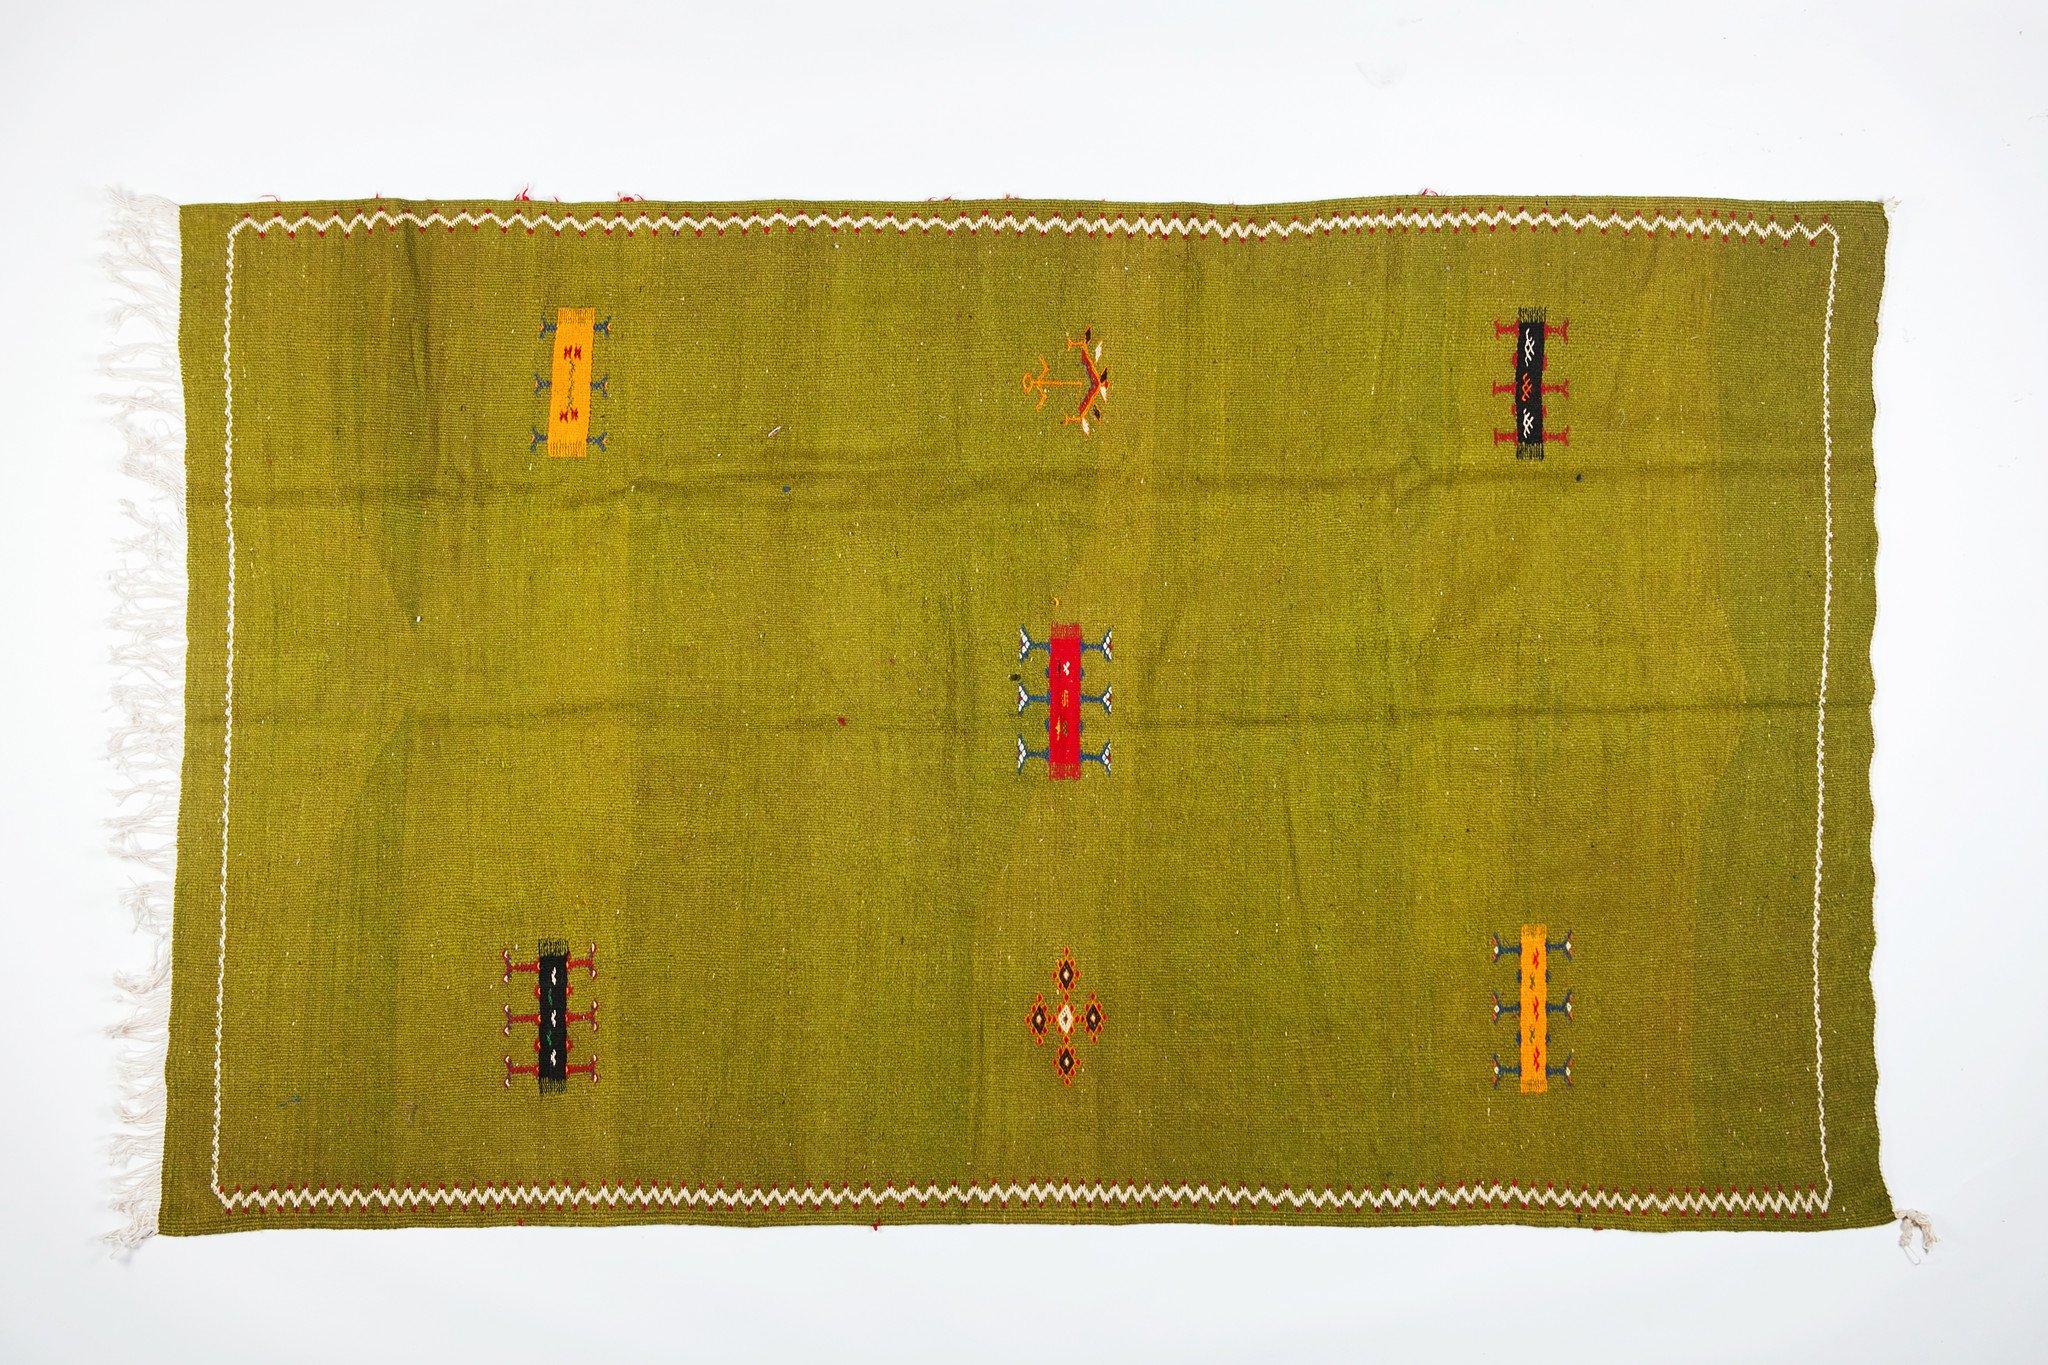 Large Green Handwoven  Moroccan Berber Rug - 100% Wool Organic Dye